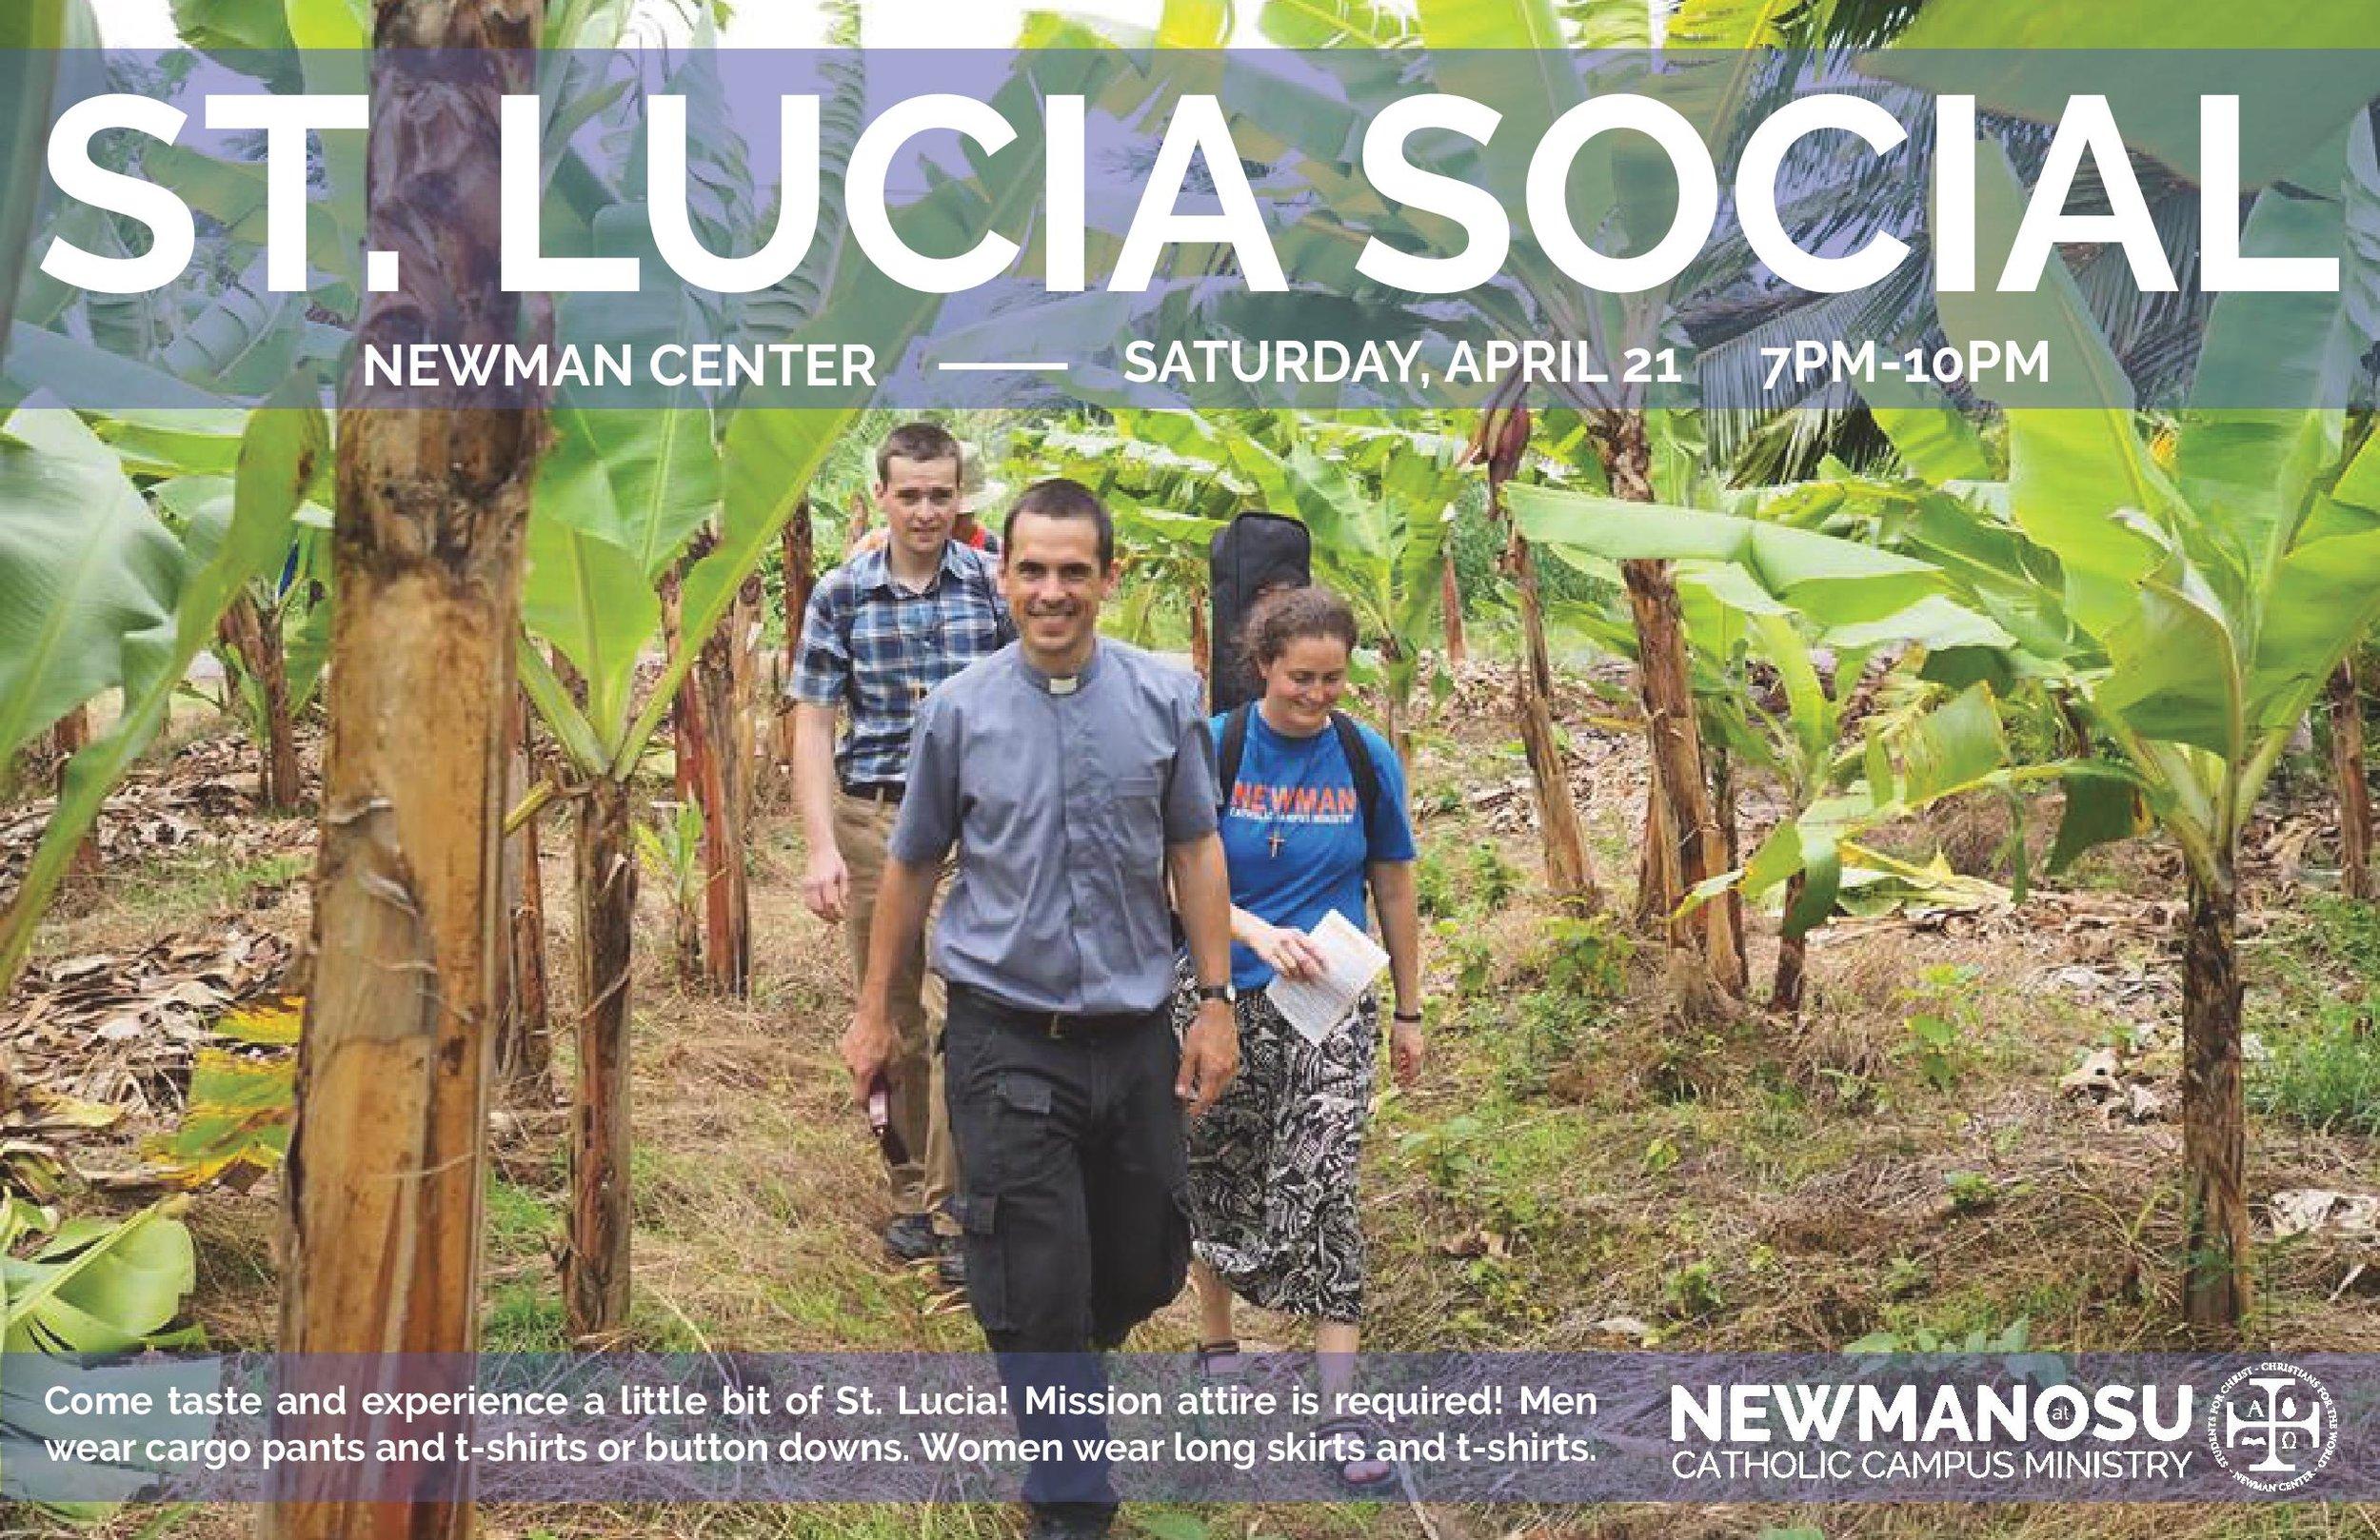 Saint Lucia Social-page-001.jpg